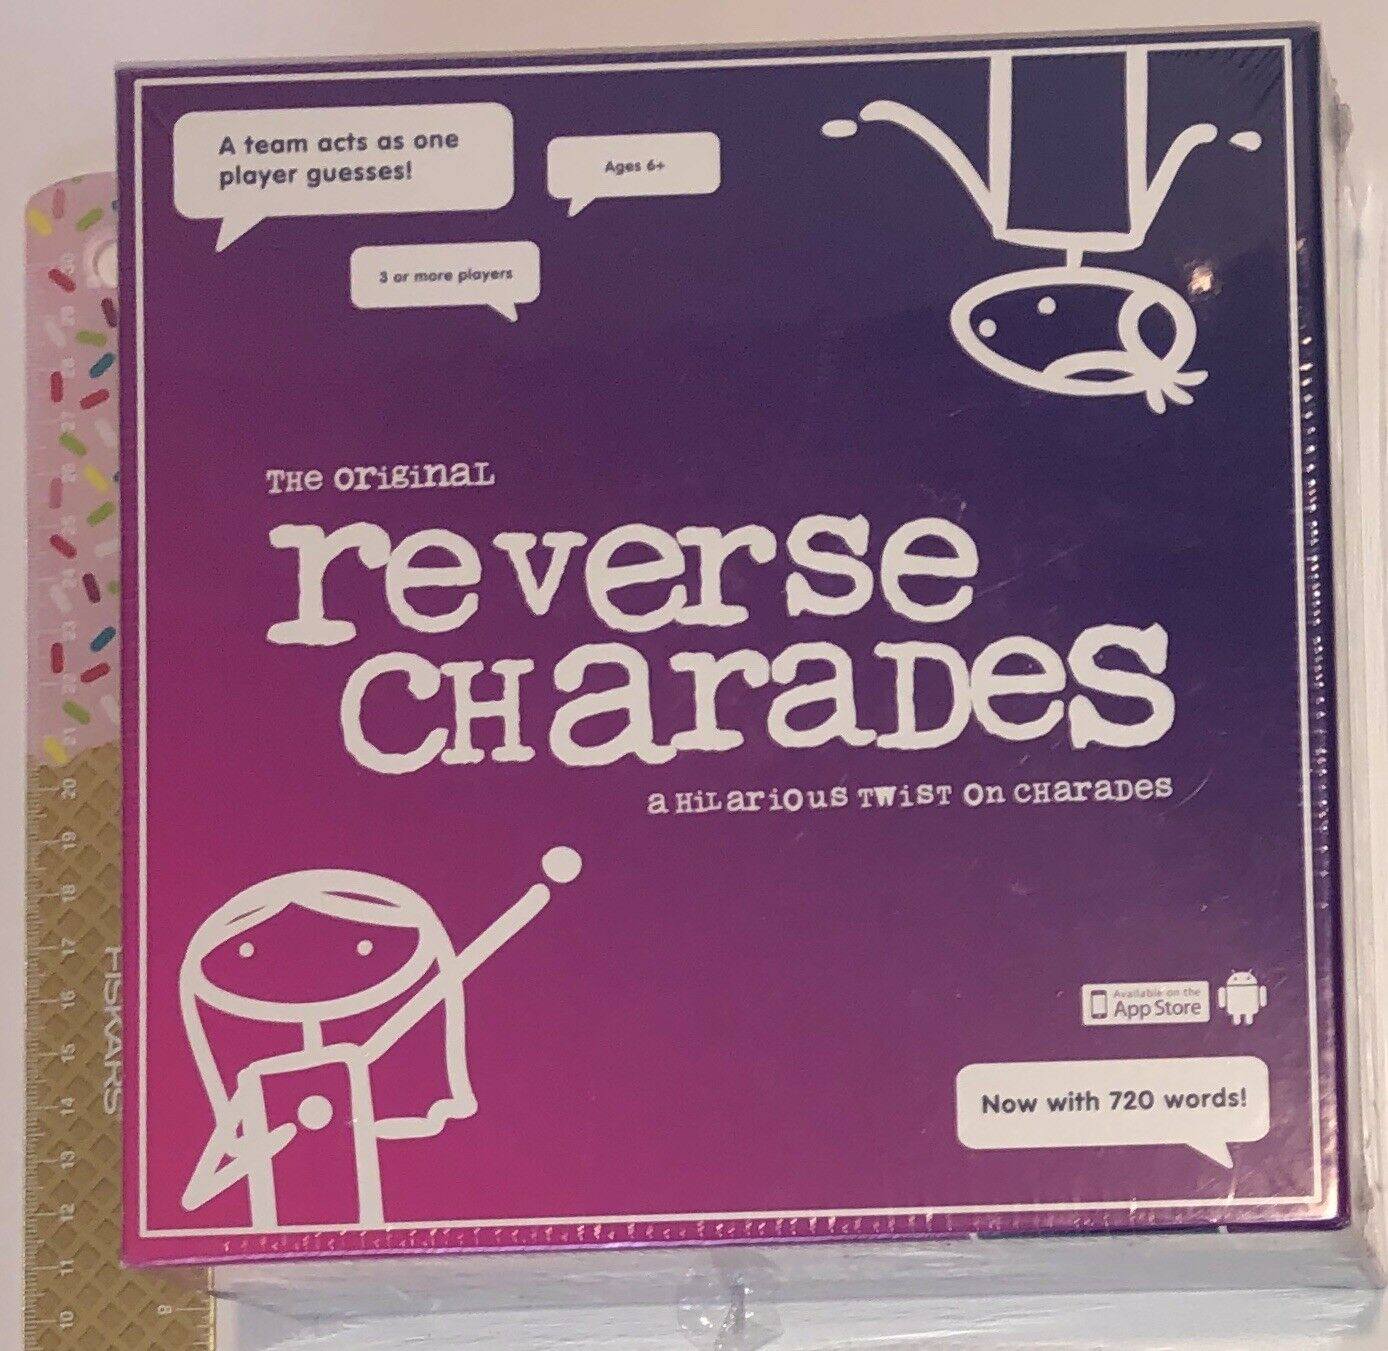 The Original Reverse Charades KNYXX BRe nuovo SEALED RARE  viola scatola VHTF   popolare